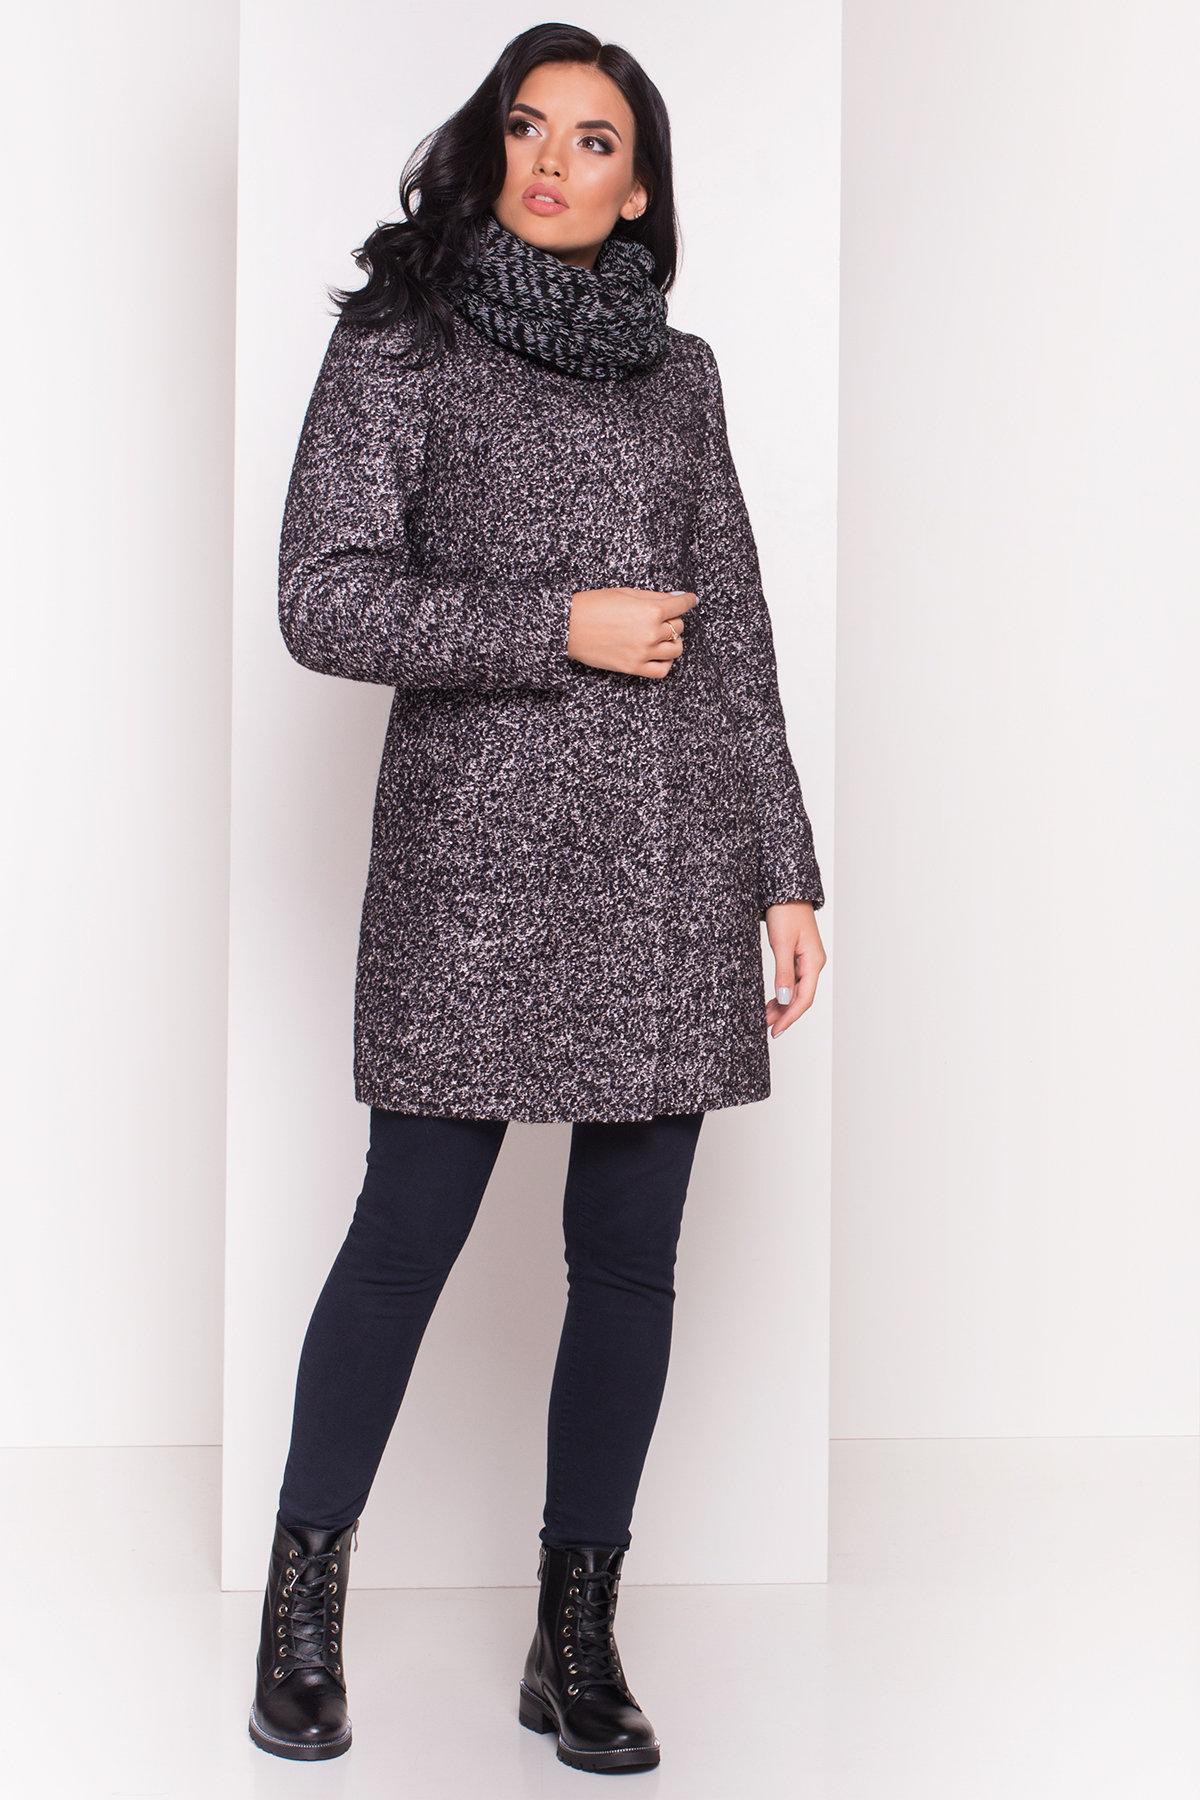 Пальто зима Фортуна 0574 Цвет: Черный / серый 6